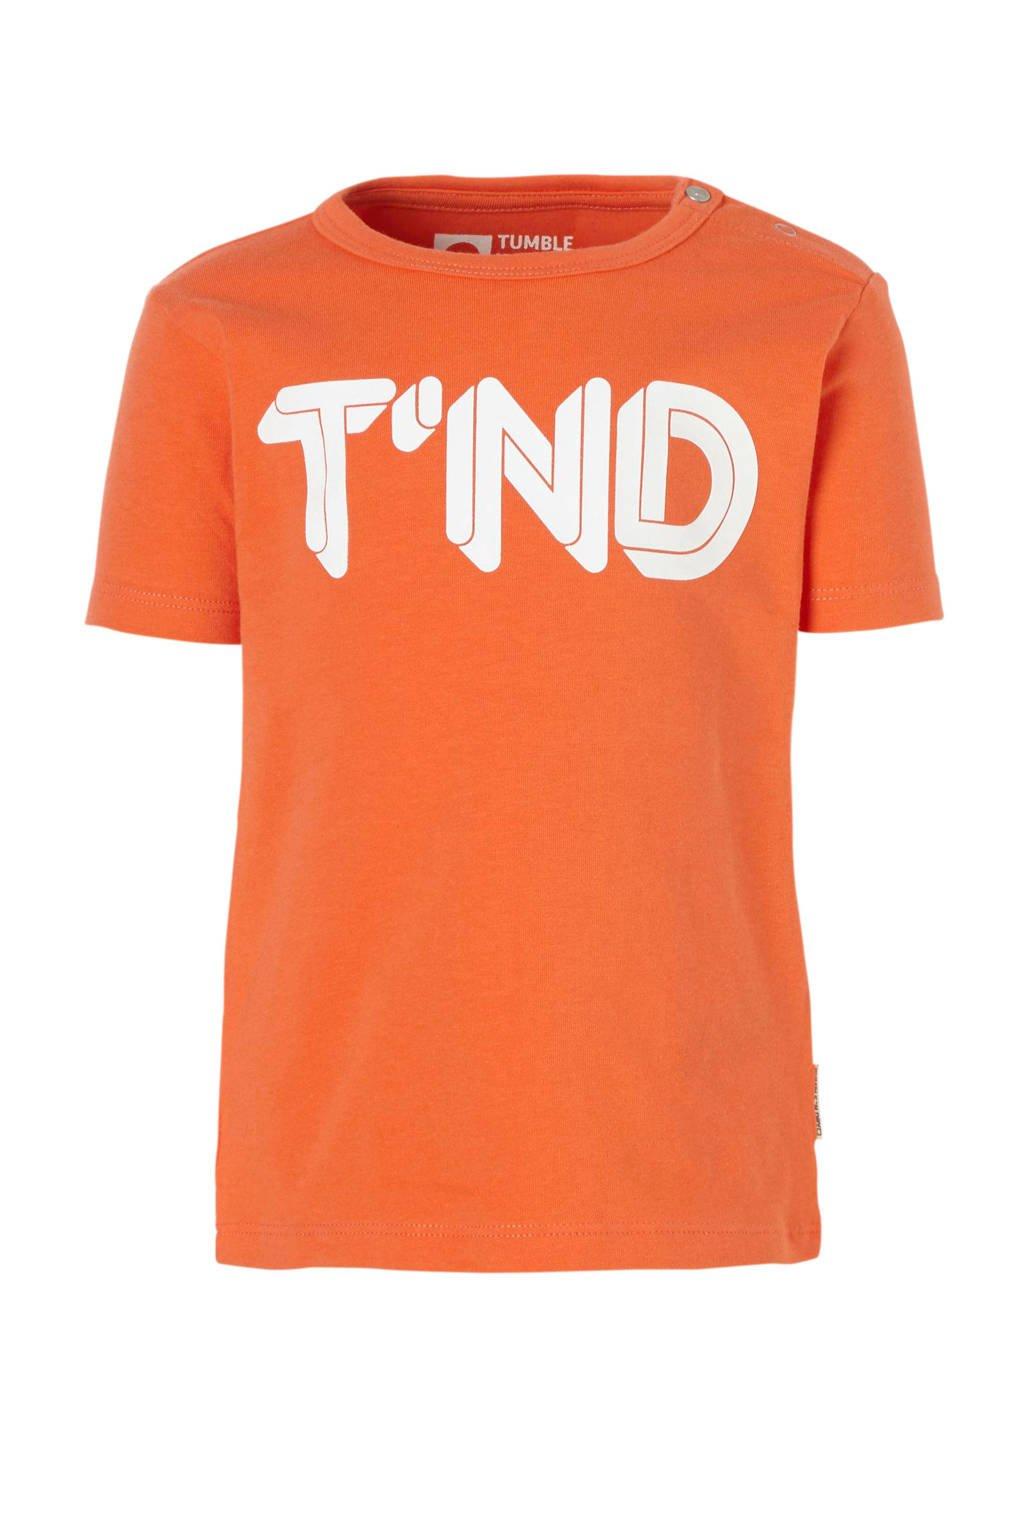 Tumble 'n Dry Lo T-shirt Aquapo met logo oranje, Oranje